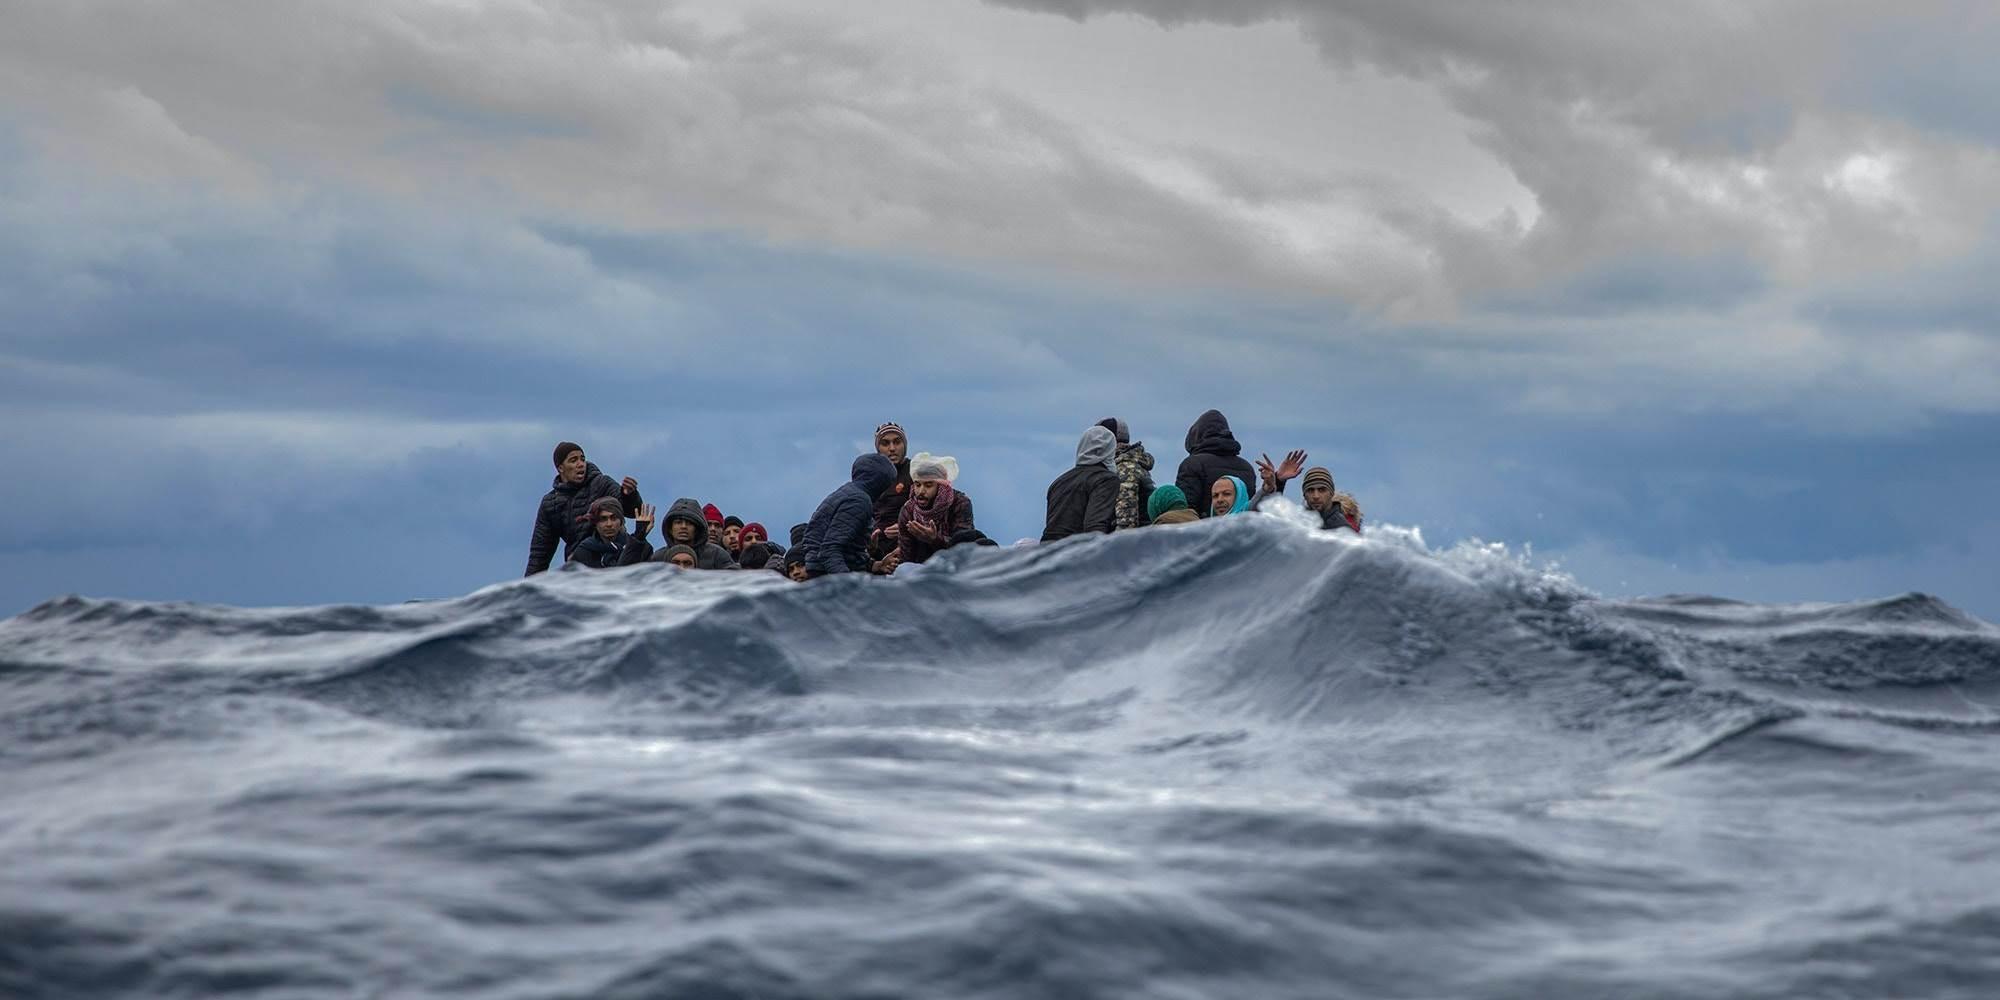 Italia recurre a fuerza antimafia contra inmigración ilegal (Foto: The Intercept/AP)